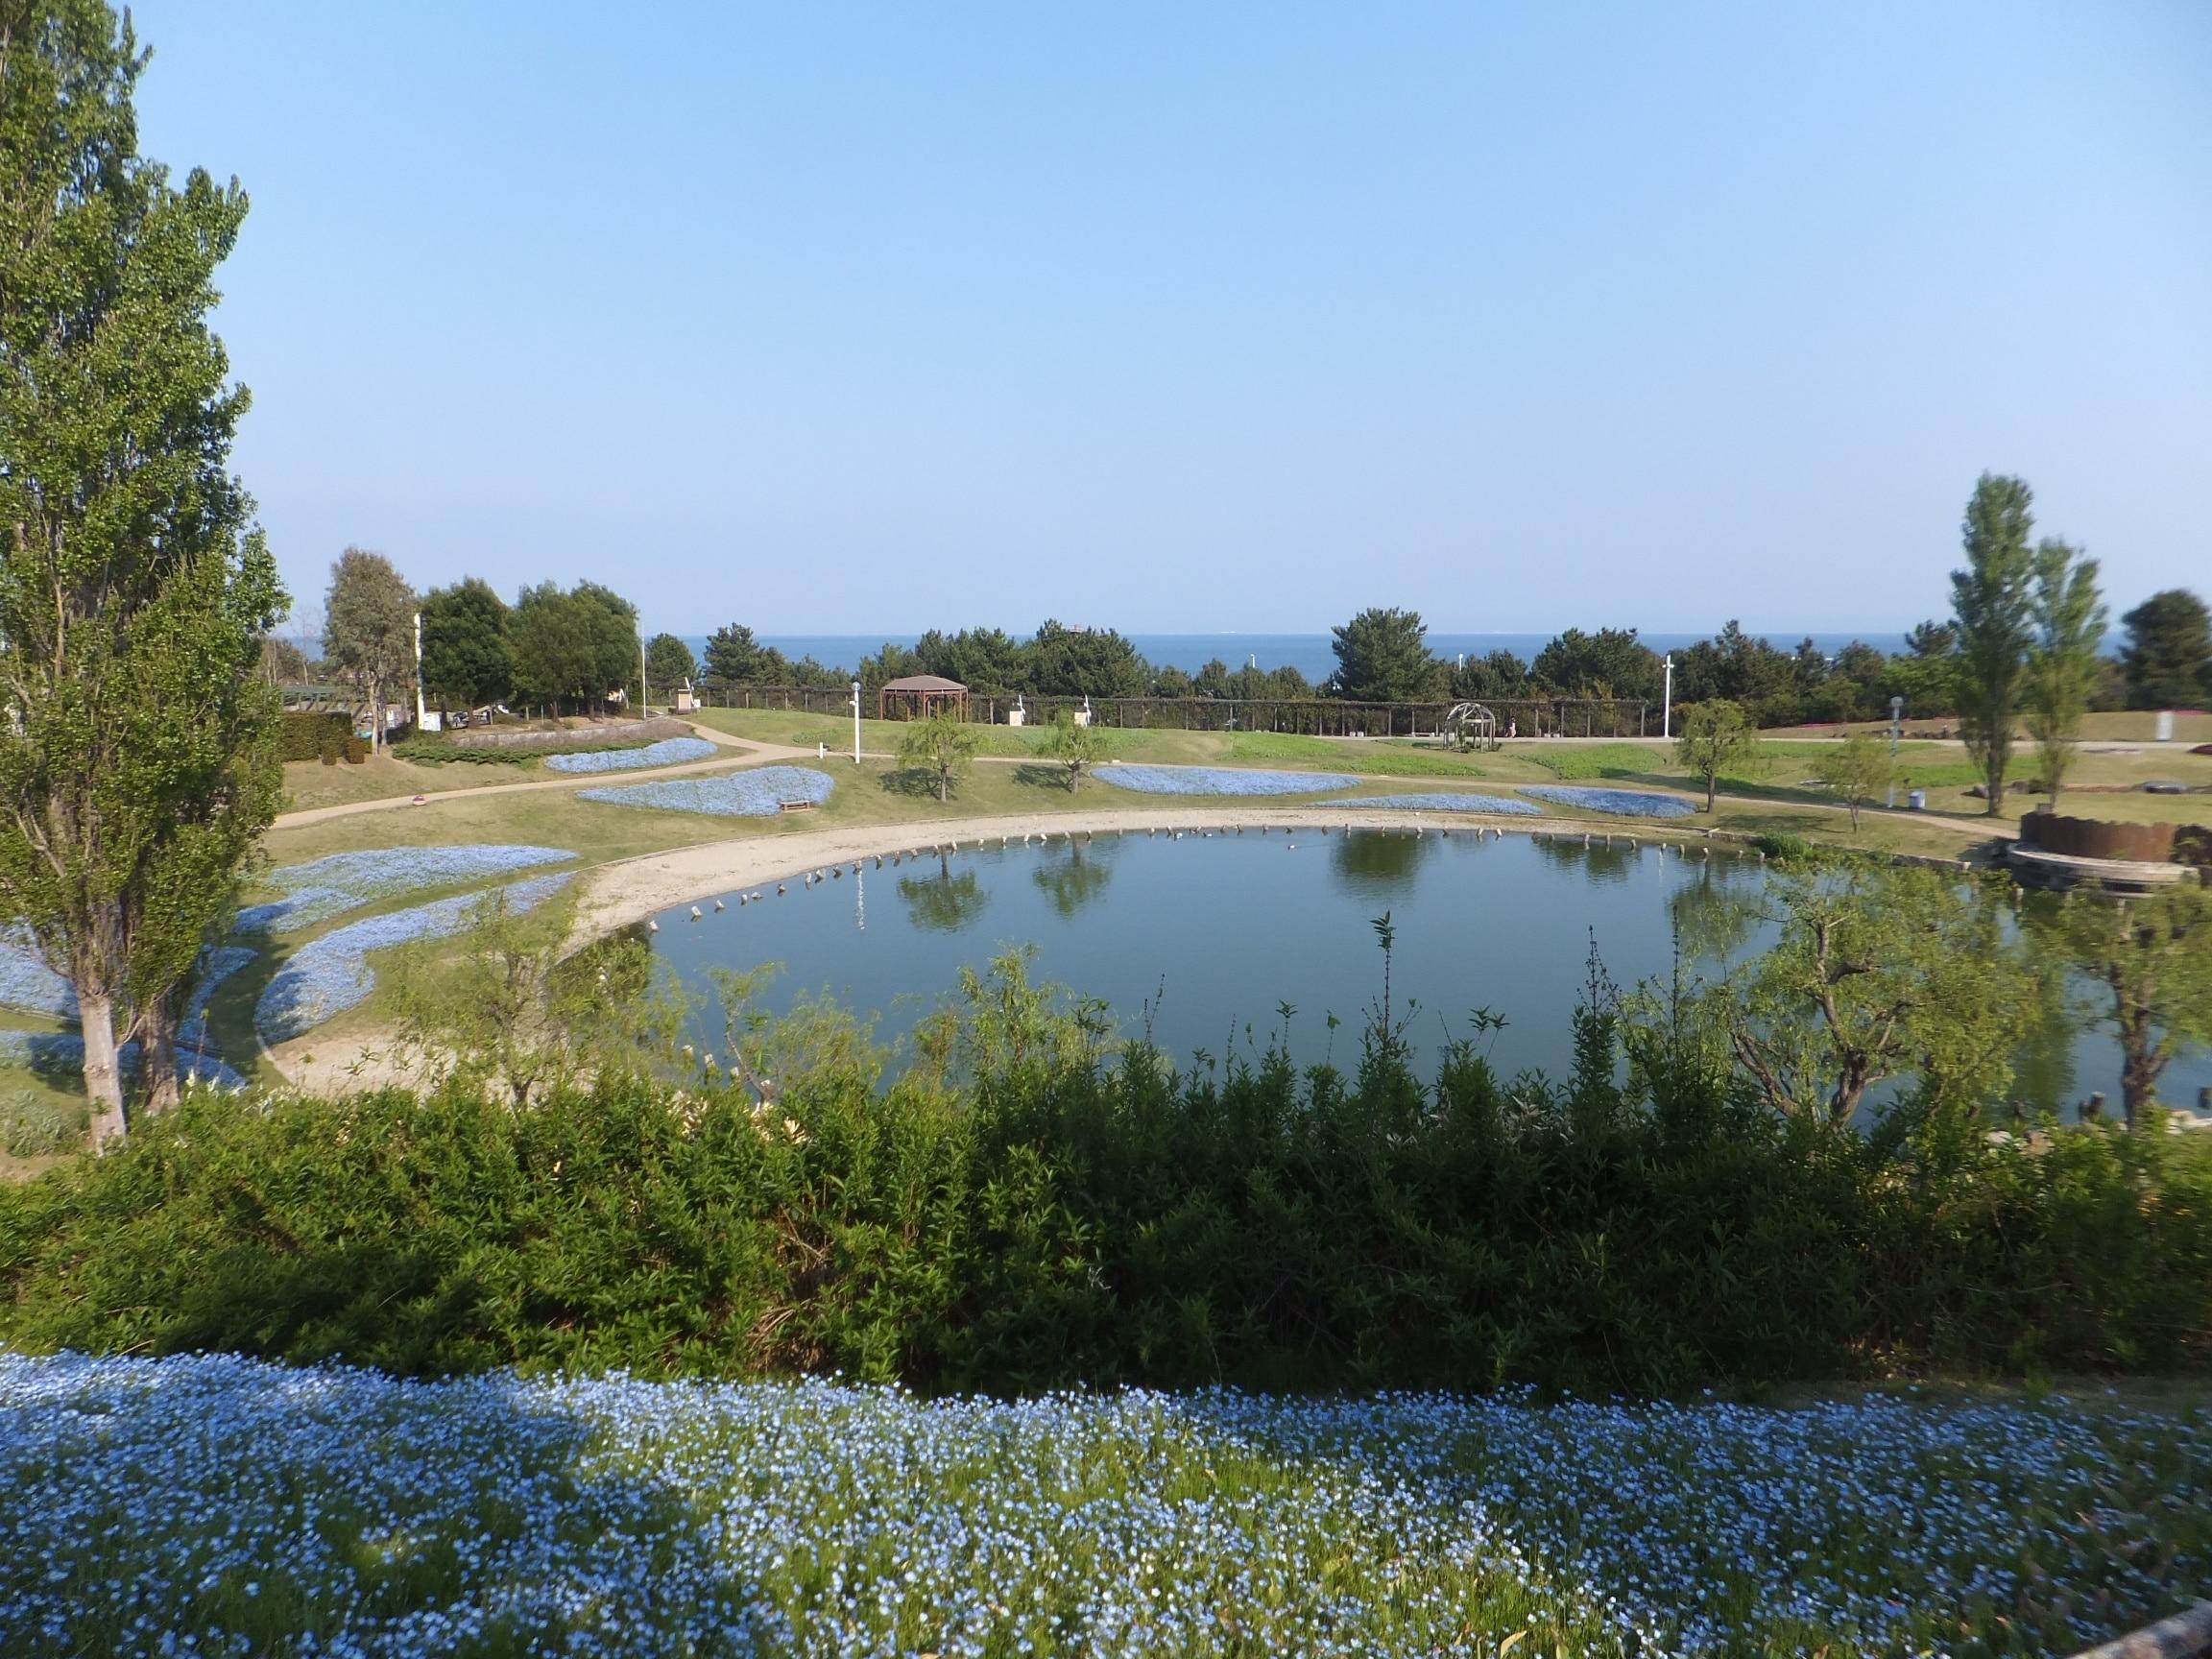 Awaji, Hyogo Prefecture, Japan